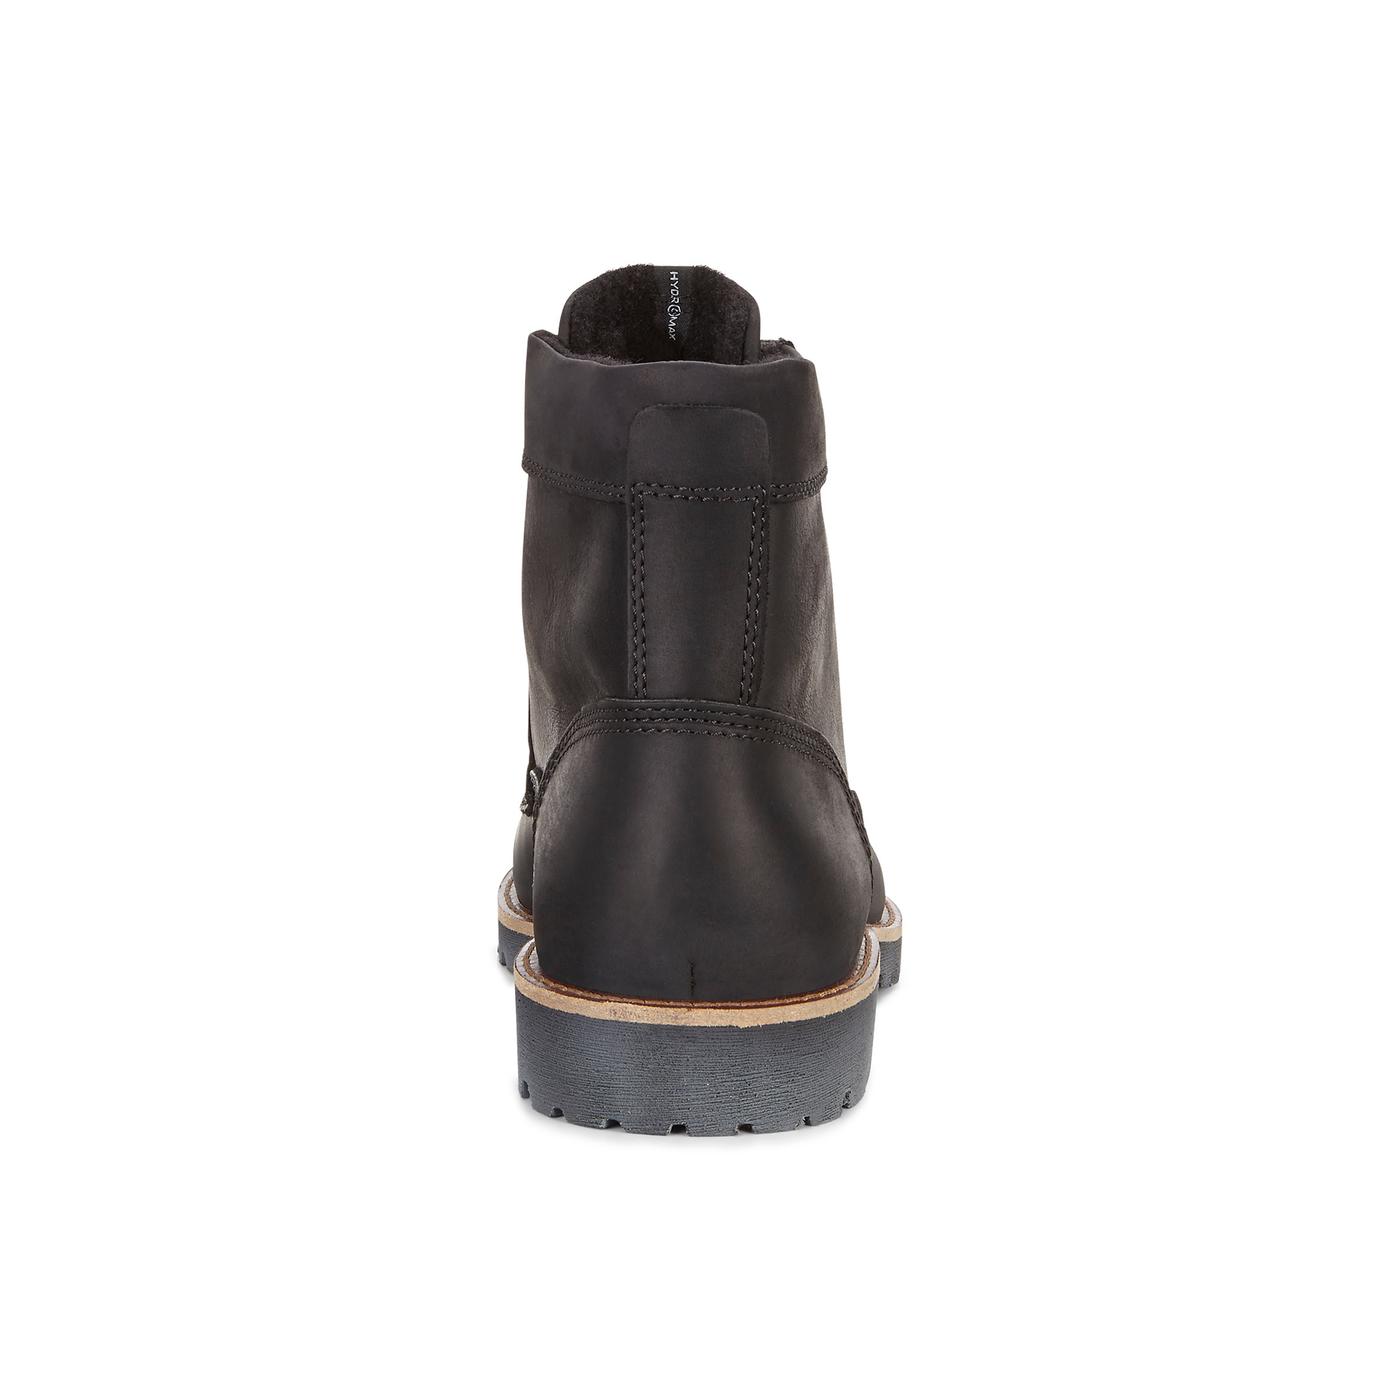 ECCO JAMESTOWN Mid-cut Boot